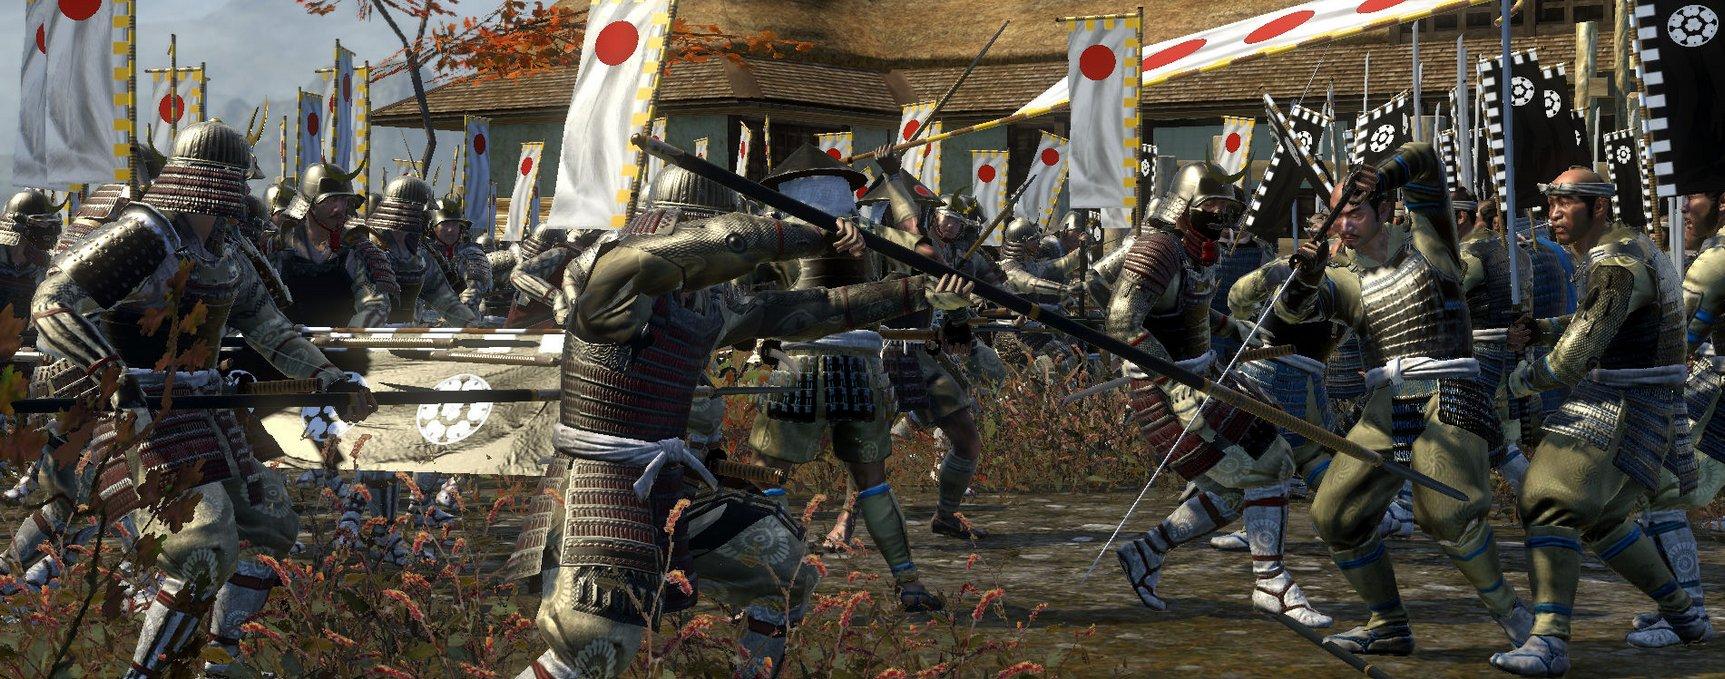 Total War: Shogun 2 patch tackles multiplayer desync bugs, improves